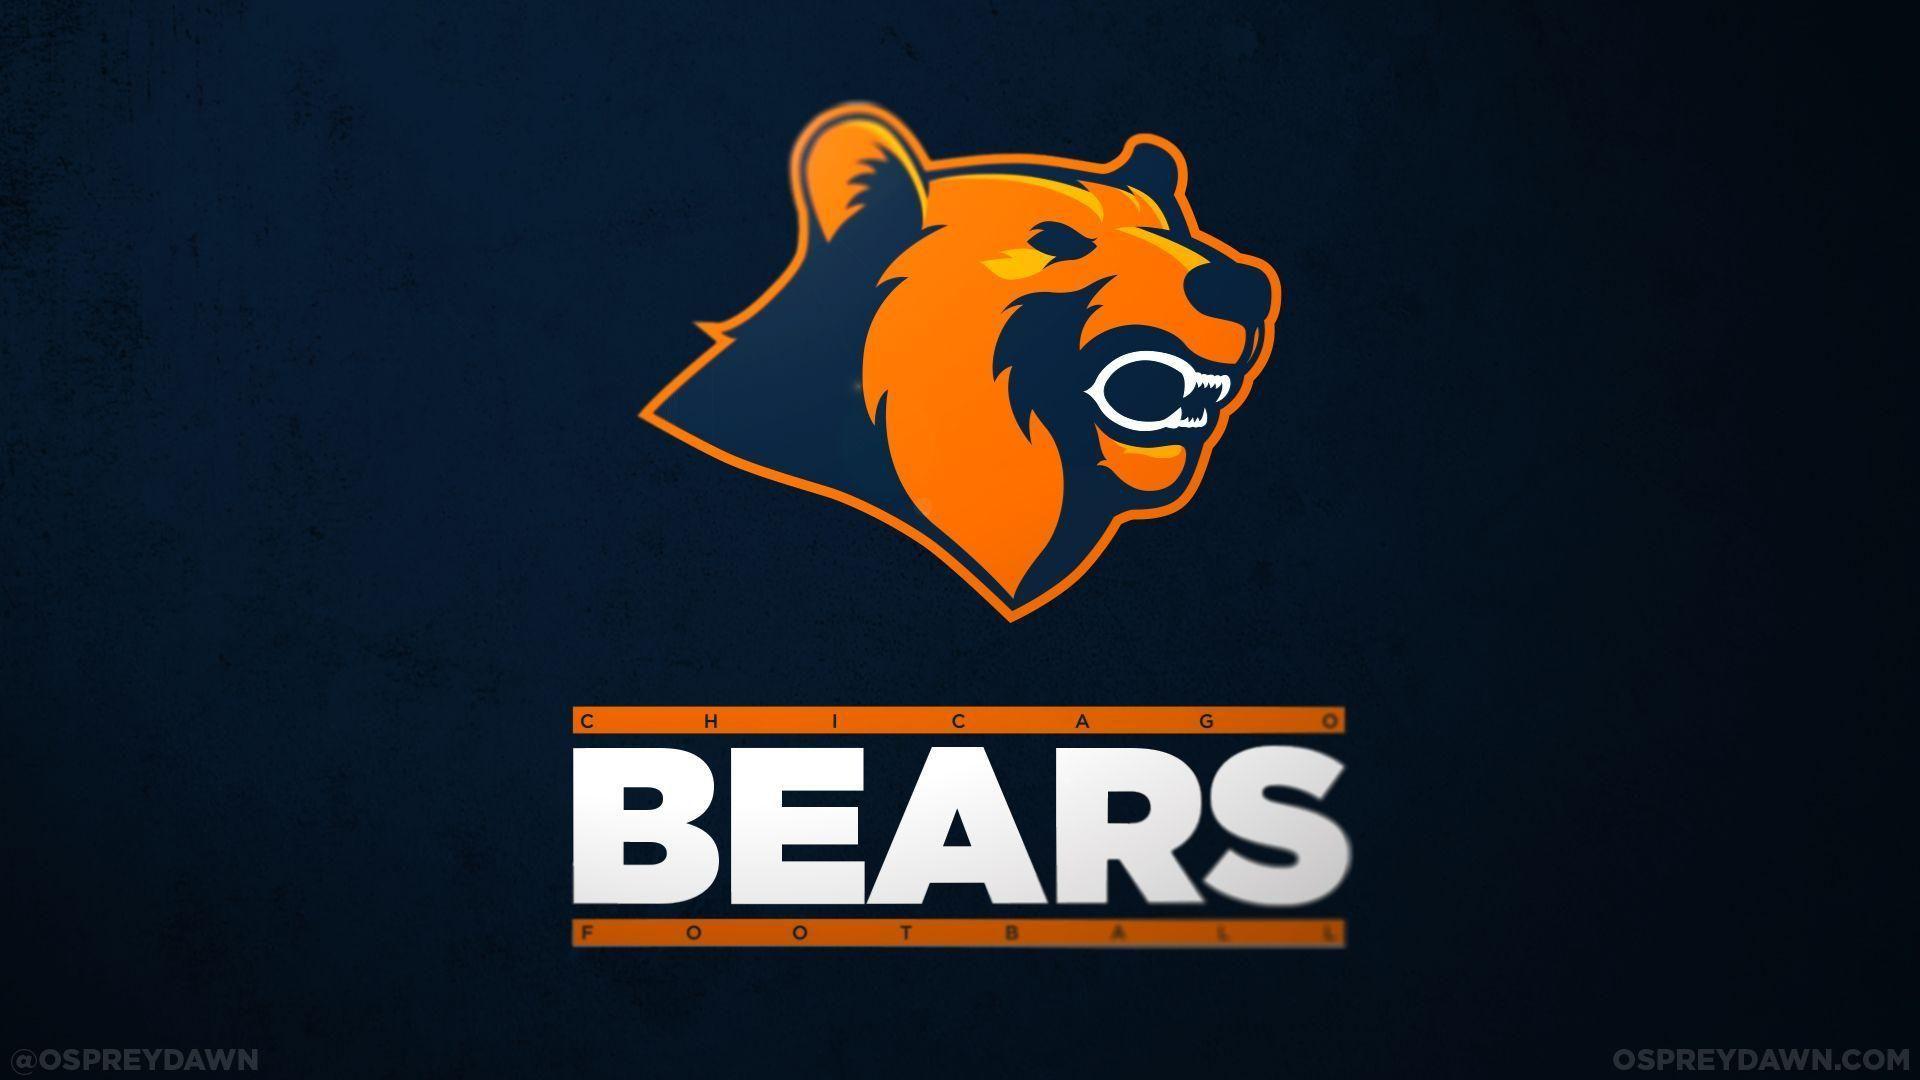 Bears Logo Chicago Bears Wallpapers 2016 Wallpaper Cave Chicago Bears Wallpaper Nfl Logo 32 Nfl Teams